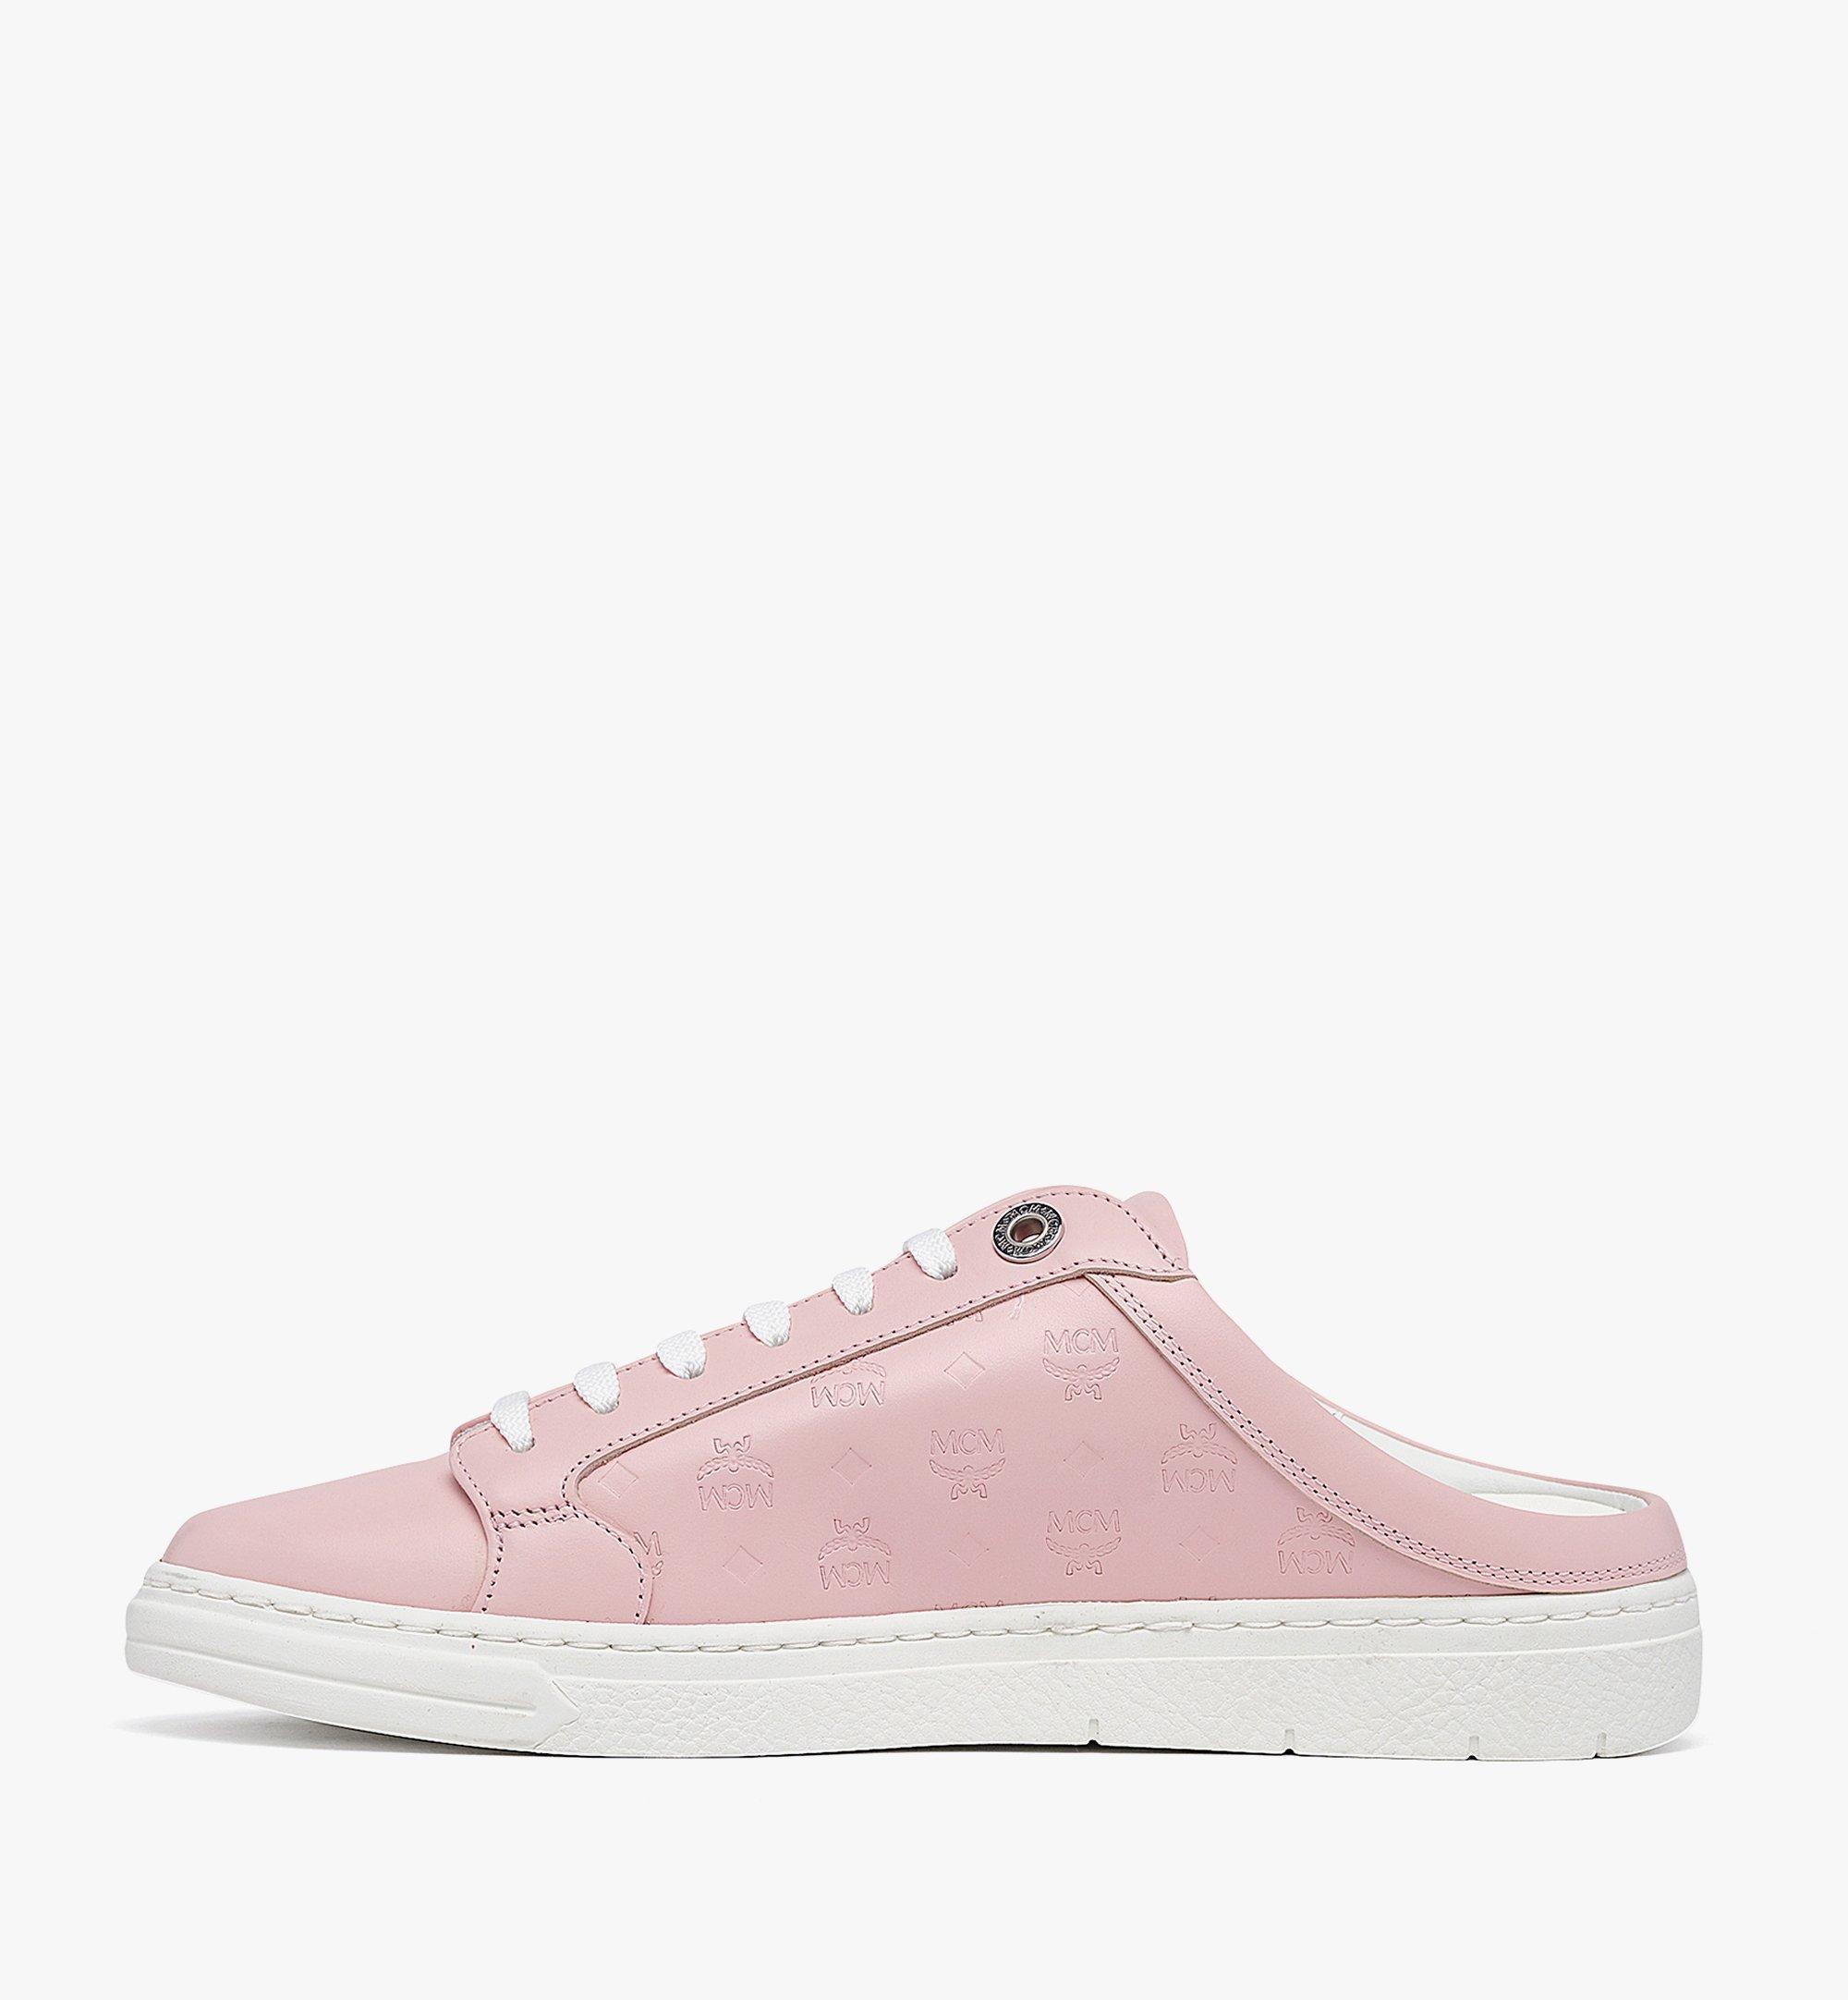 MCM Women's Terrain Lo Open Back Sneakers in Monogram Calf Leather Pink MESBAMM03QH036 Alternate View 1